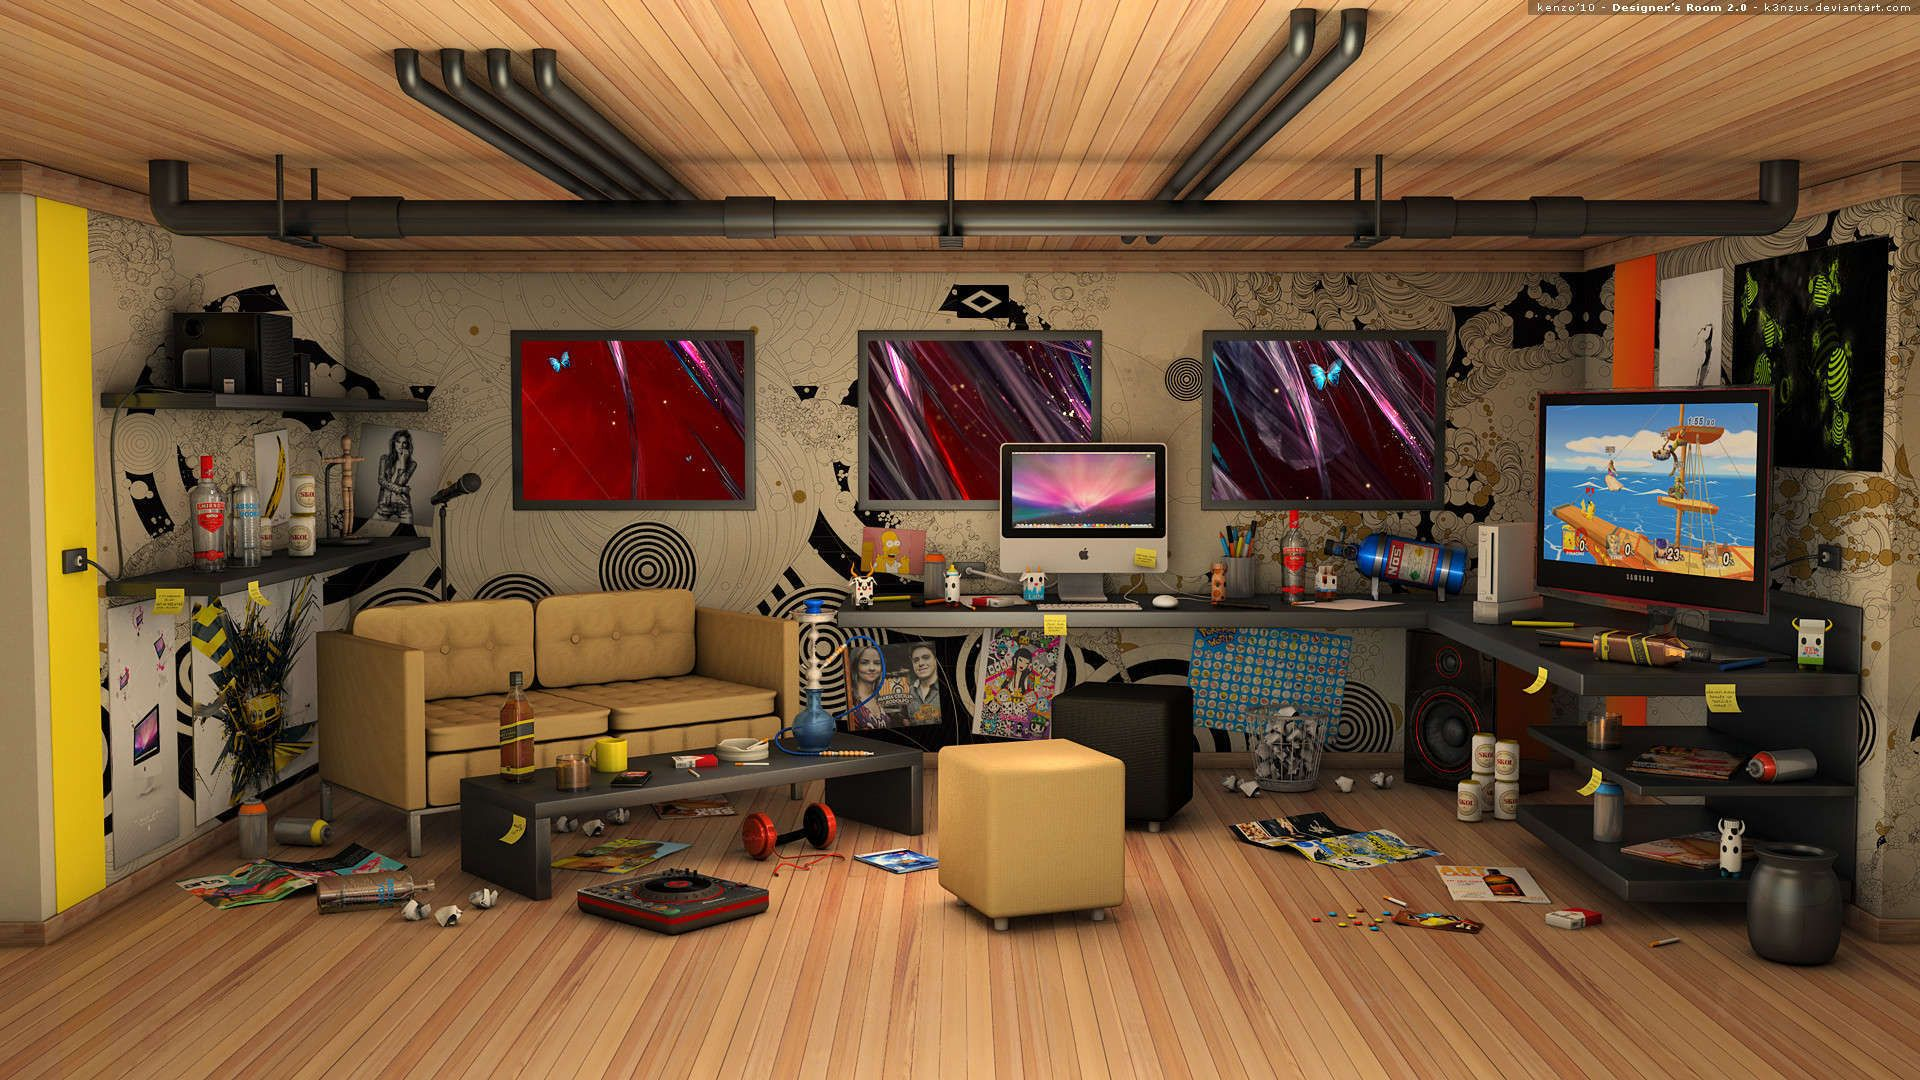 Hd Wallpaper Pc Room 1080p Room Wallpaper Room Tech Room